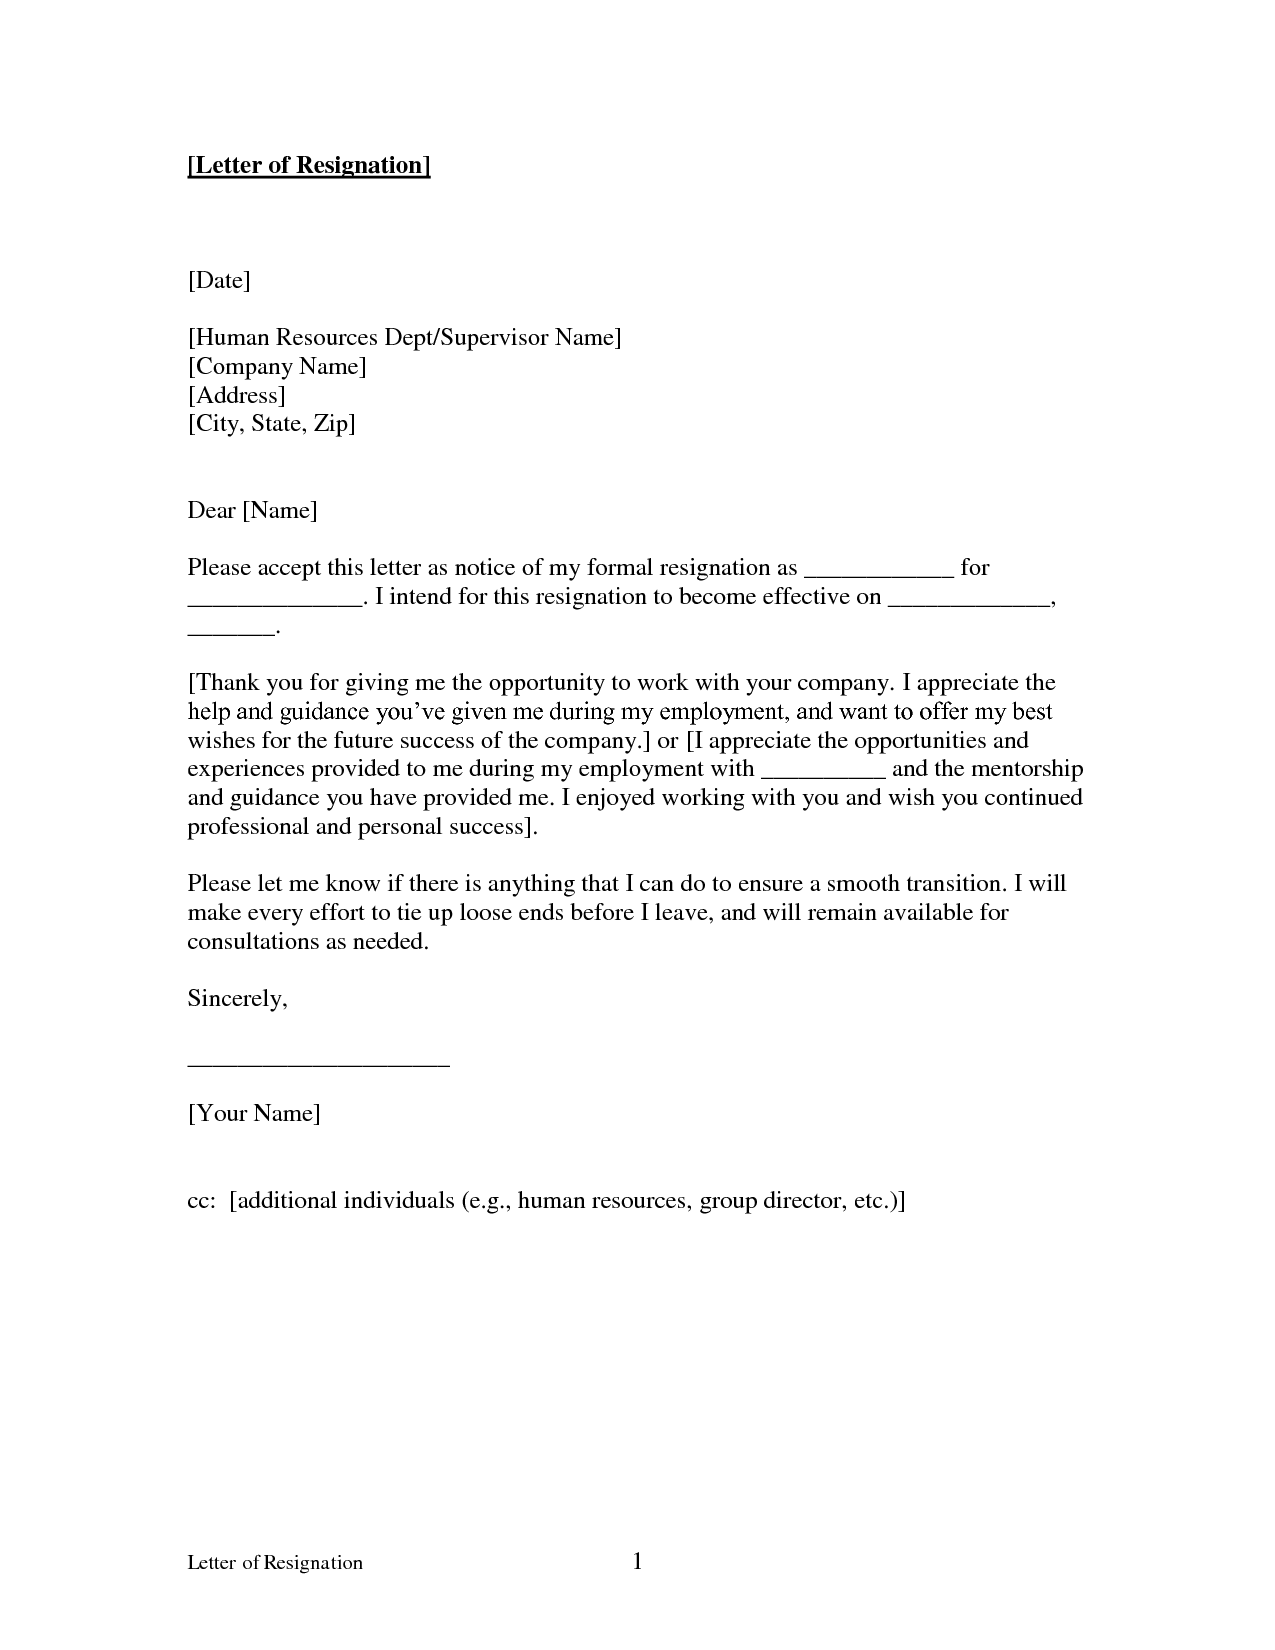 resignation letter example professional resume cover resignation letter example sample resignation letters career faqs letters of resignation template centredassistance